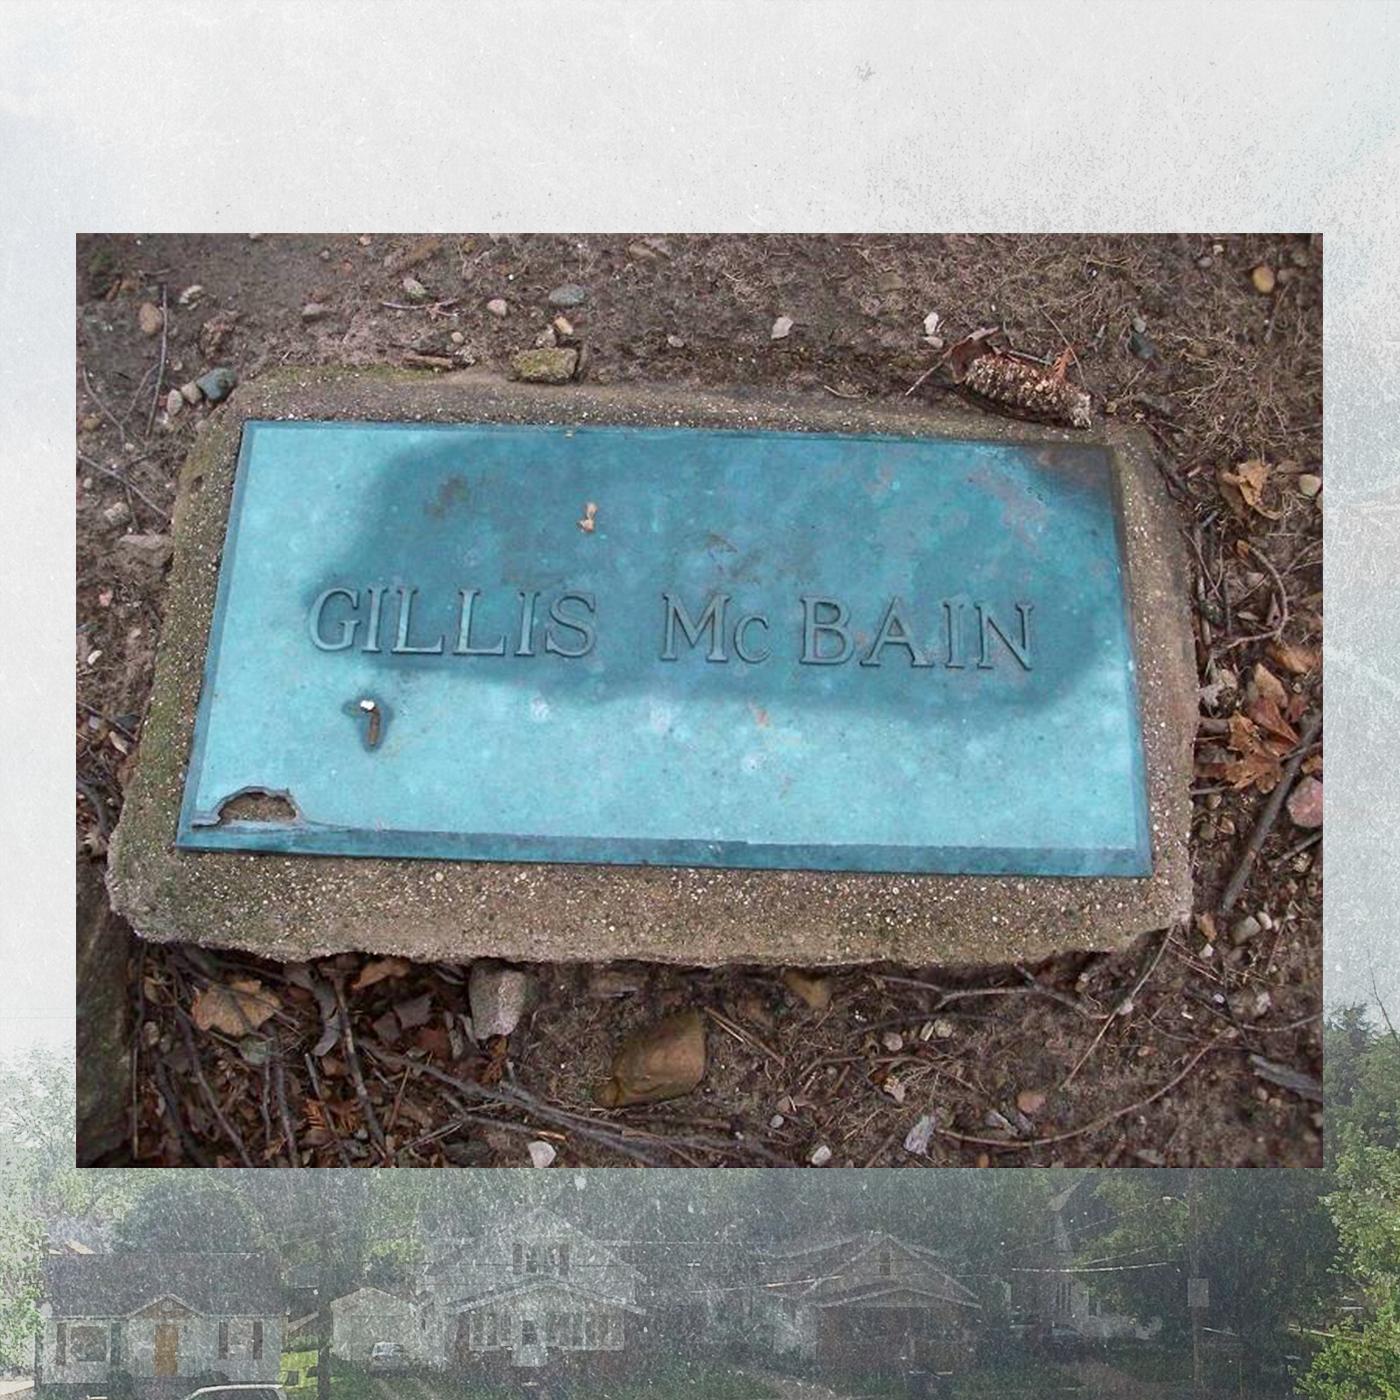 The grave of Gillis McBain